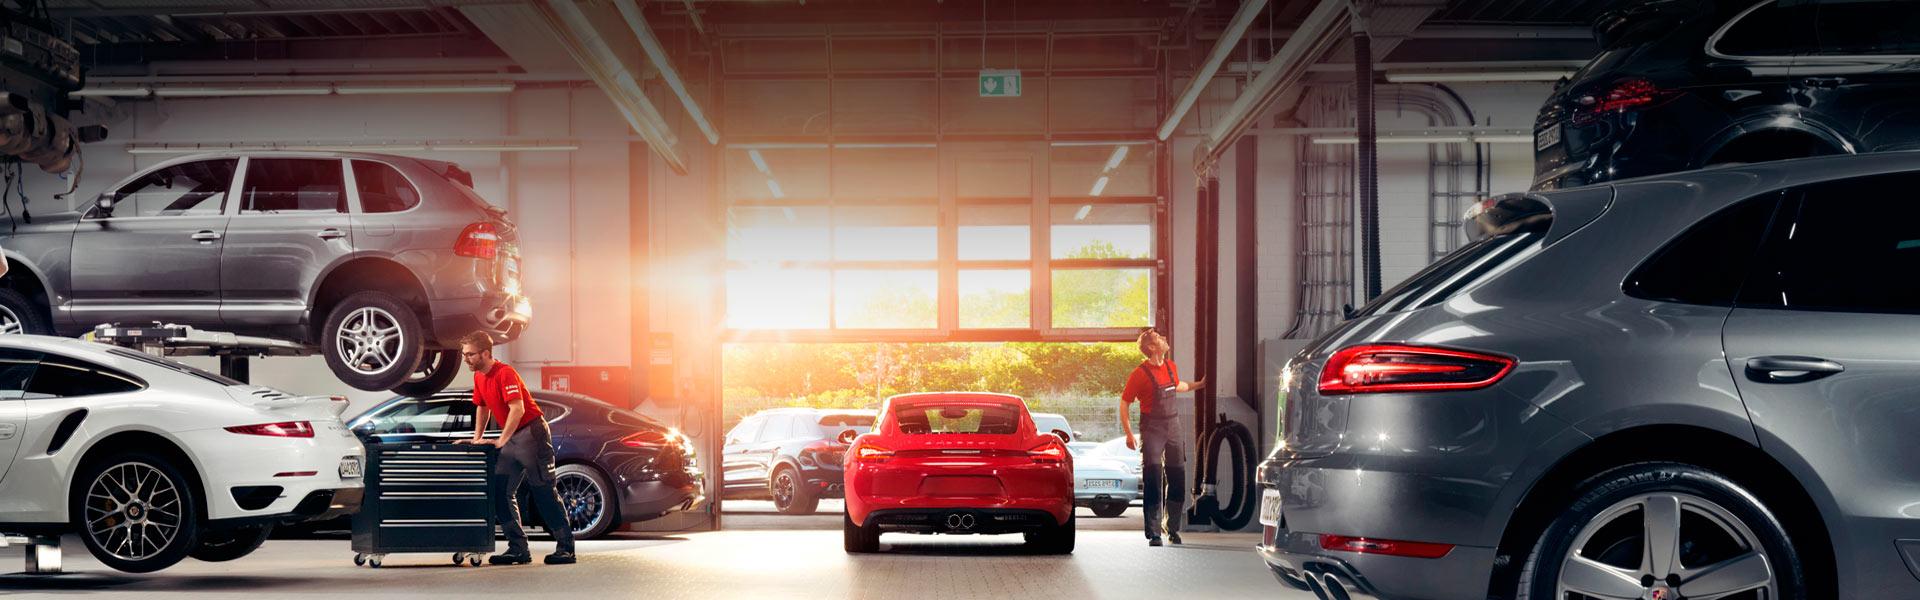 Замена рулевой тяги Авто